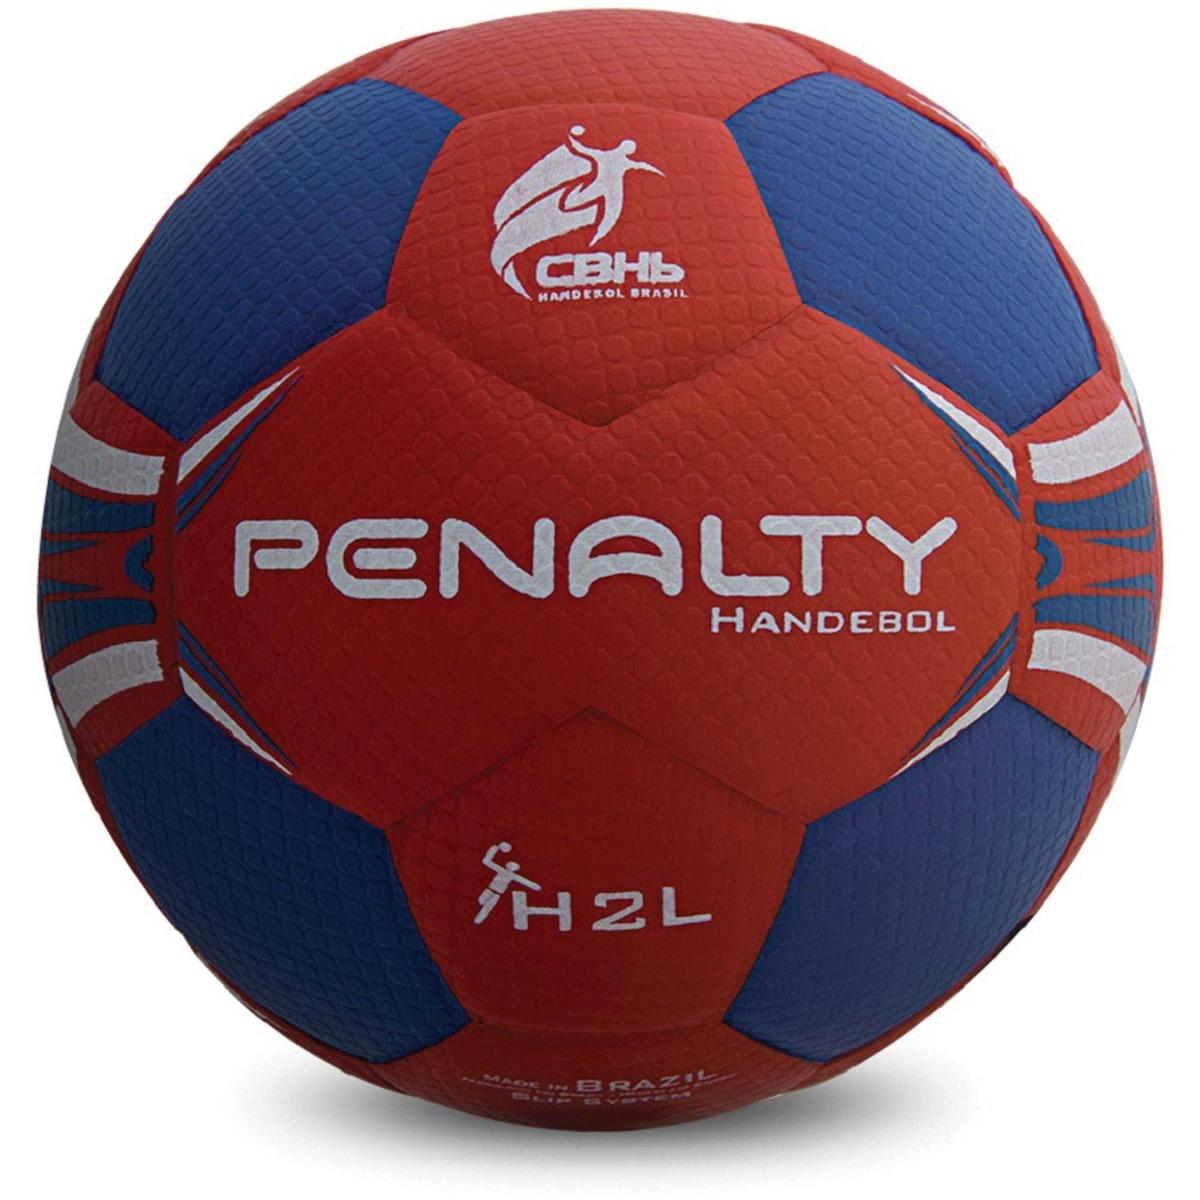 a3762da049 Bola Handebol Hand Grip H2l Fem Sem C Az-vm Penalty - R  95